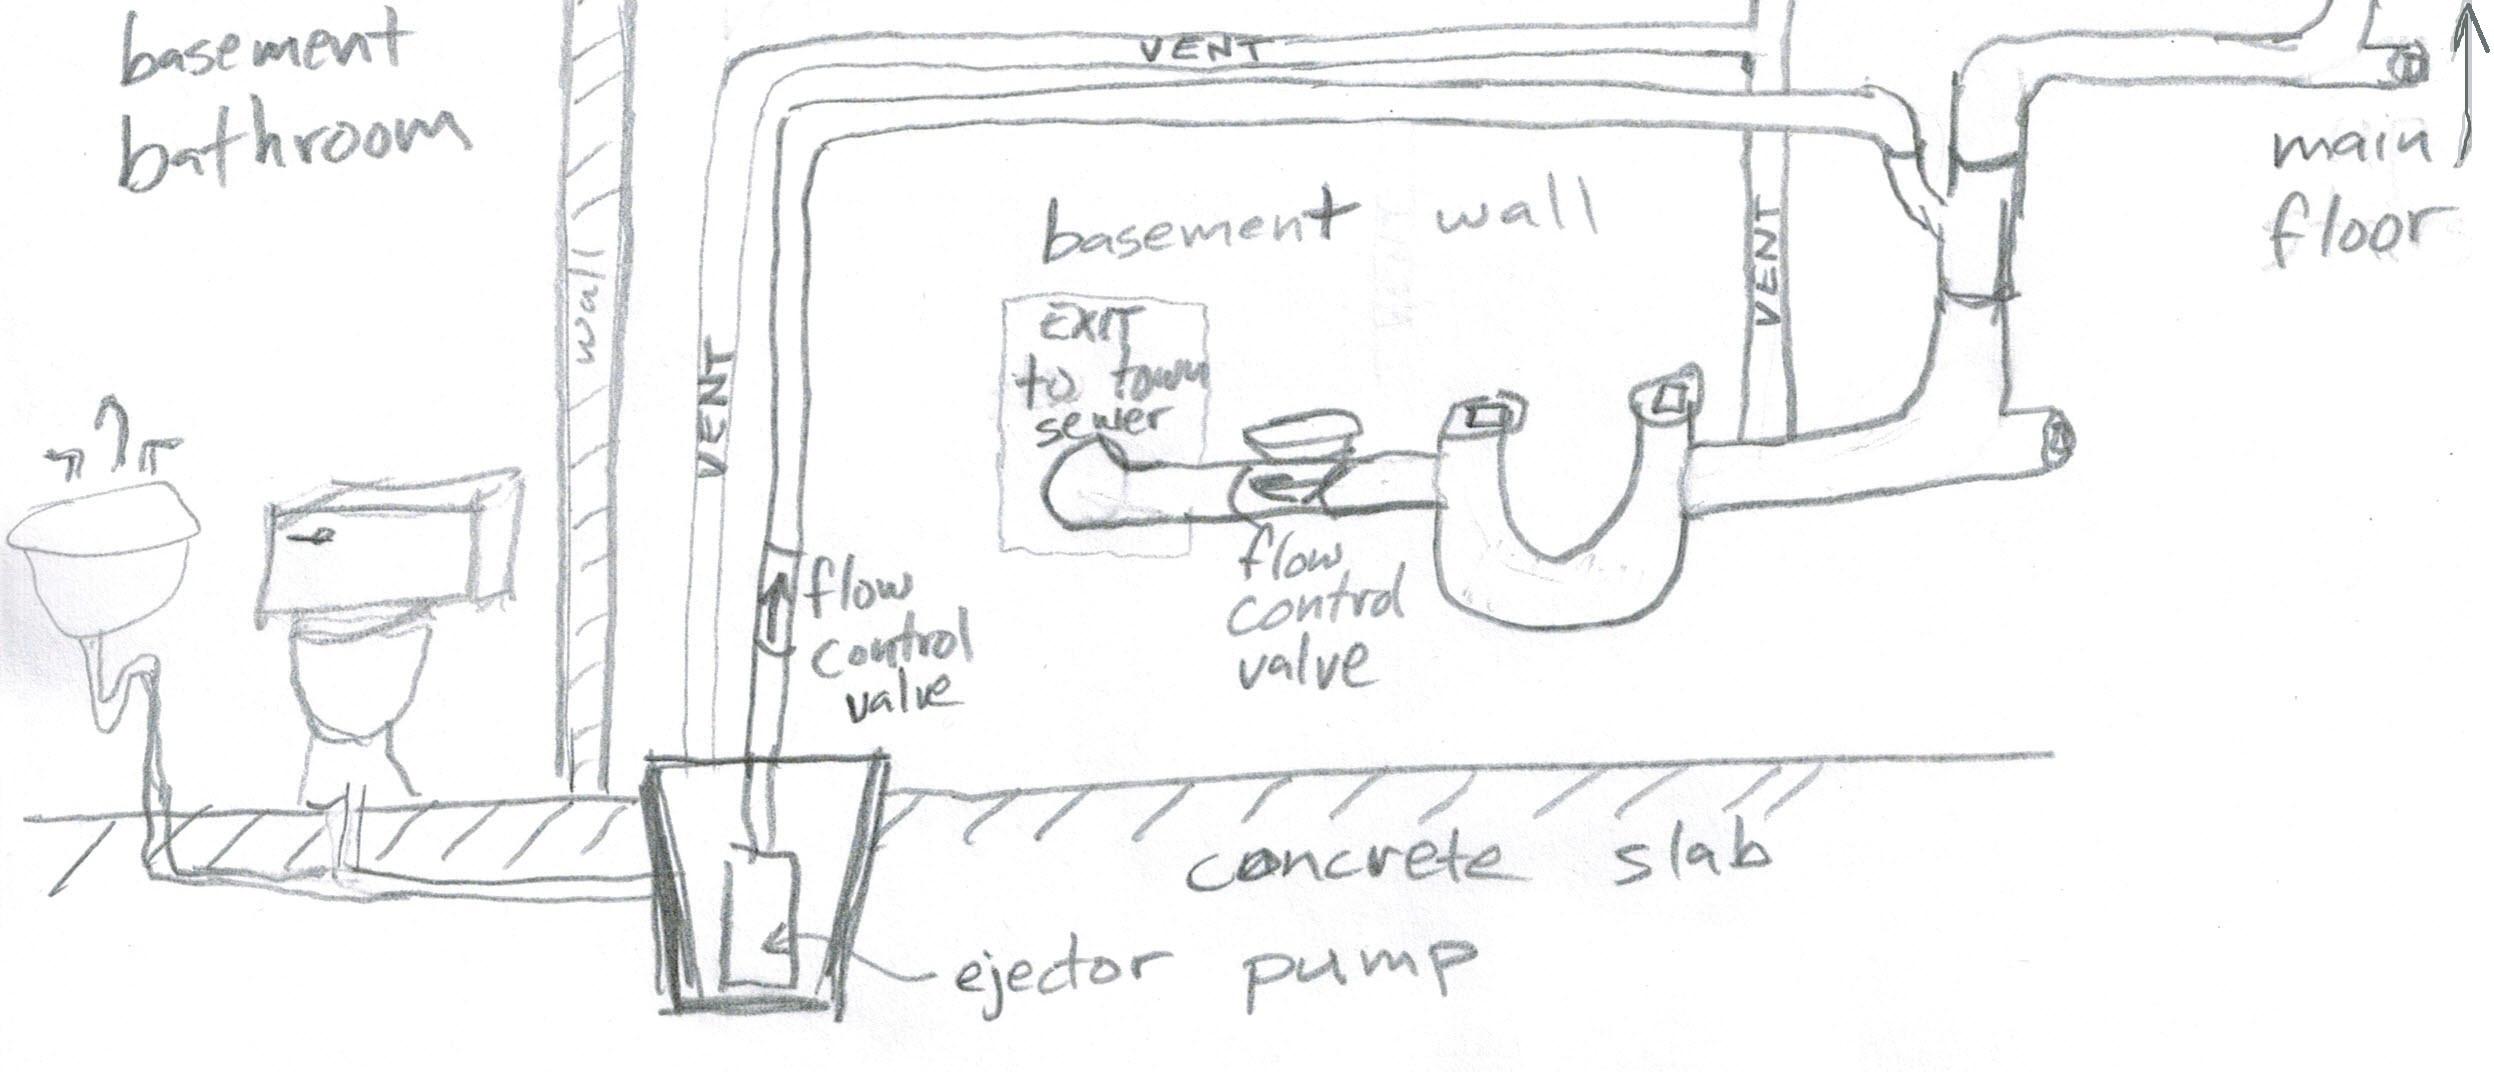 sewage ejector pump diagram